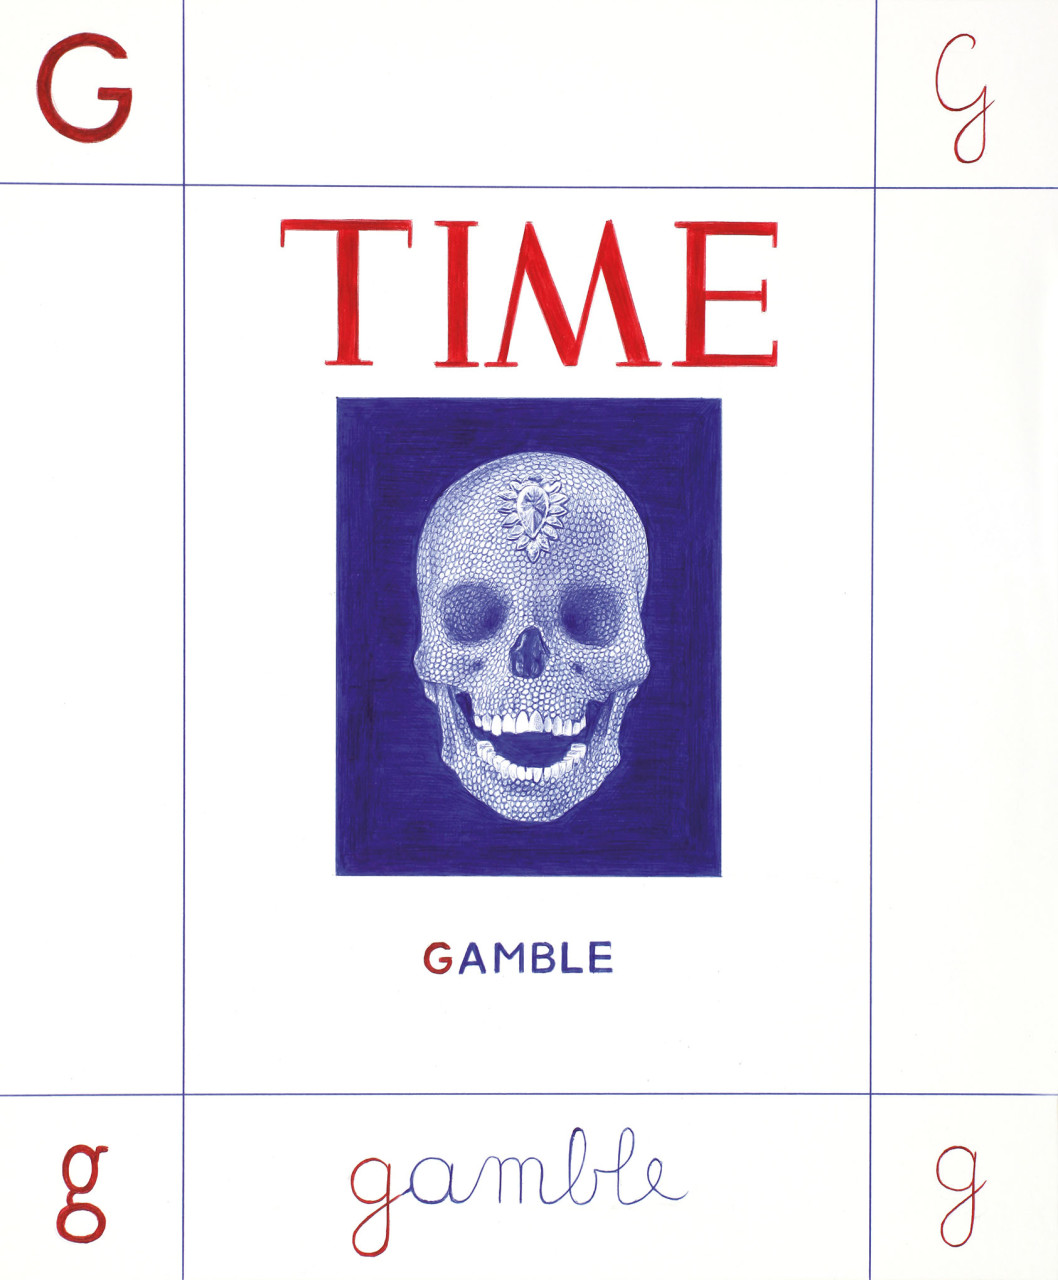 08G-gamble_bassa